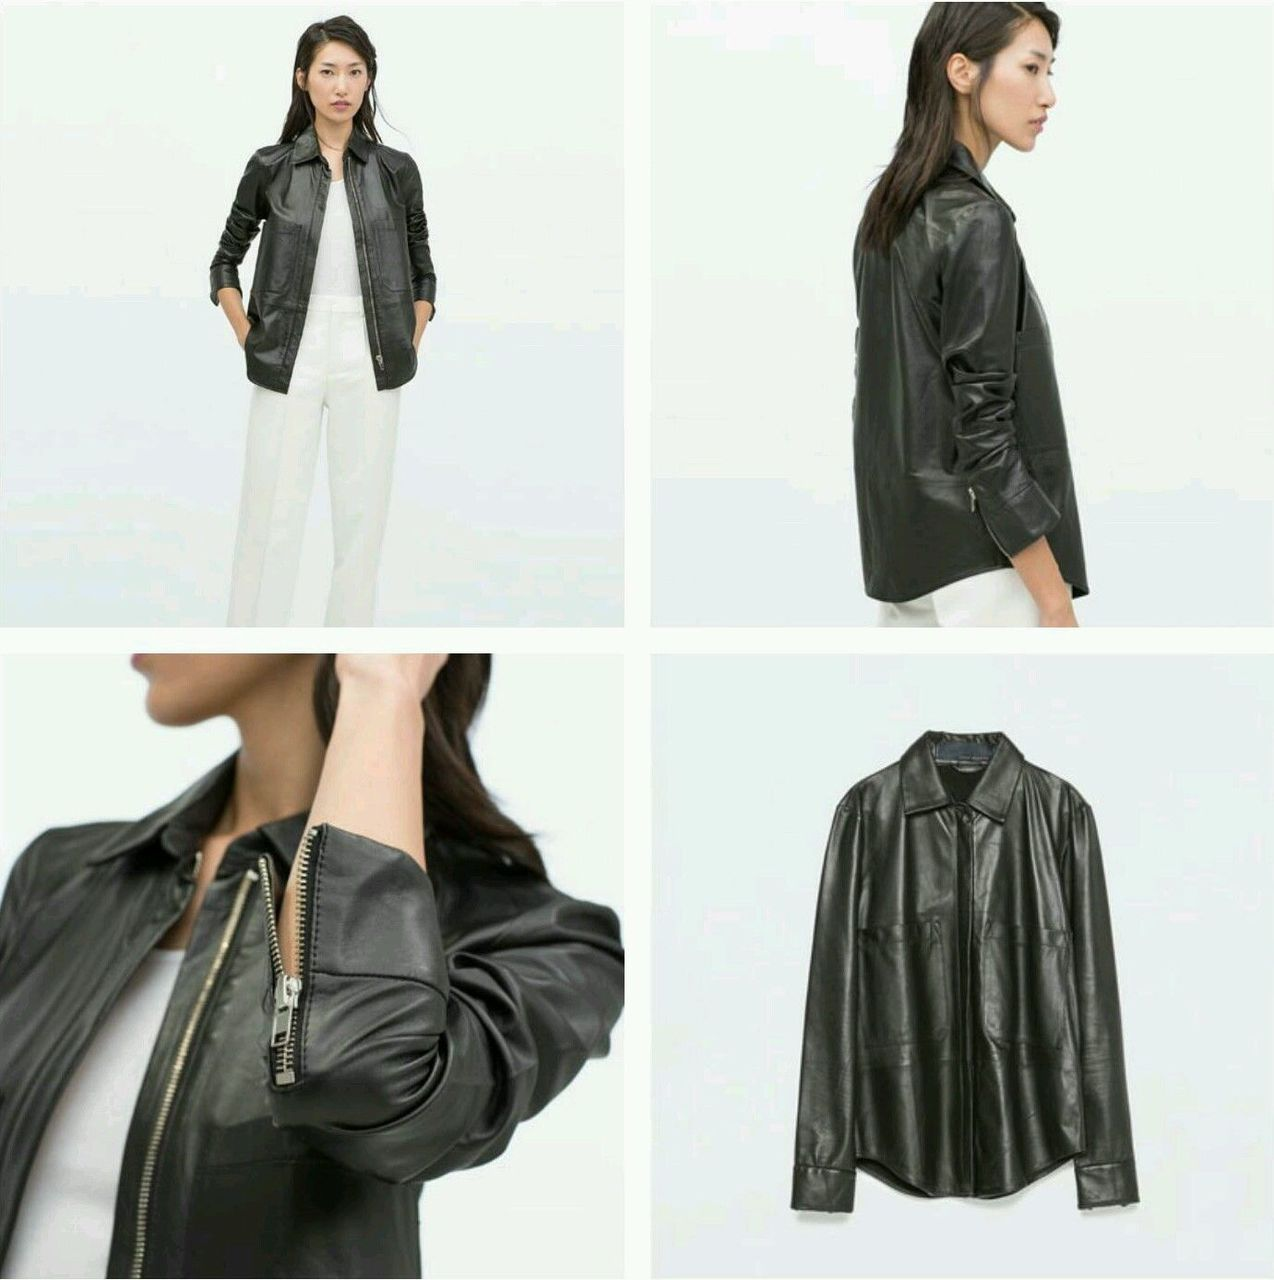 Zara Leather Biker Jacket Zara leather, Clothes for